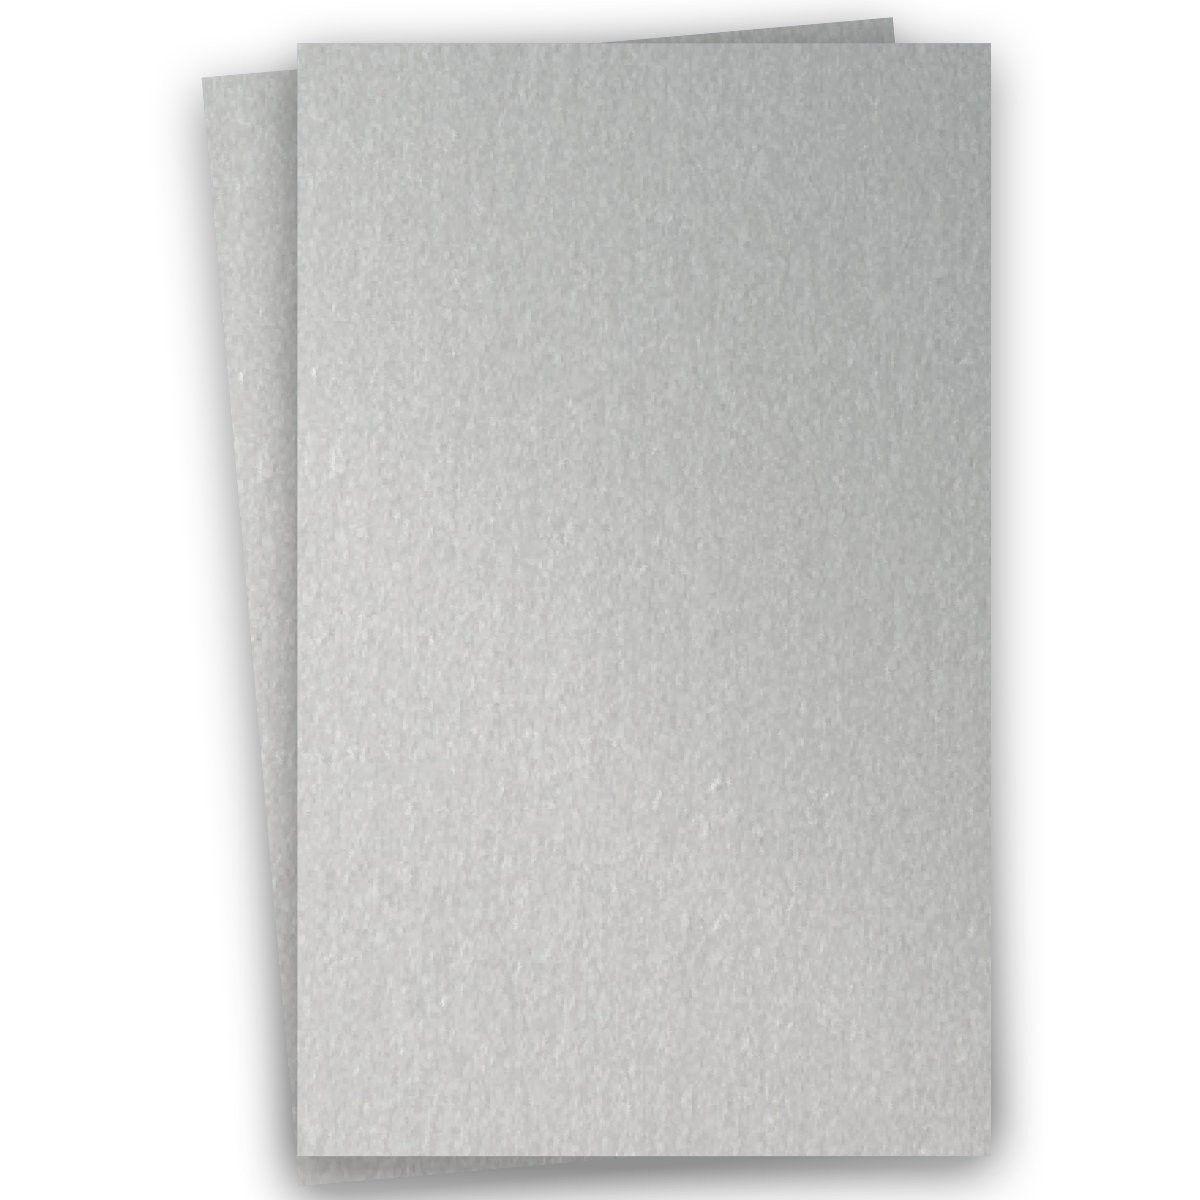 Stardream Metallic 11X17 Card Stock Paper - SILVER - 105lb ...